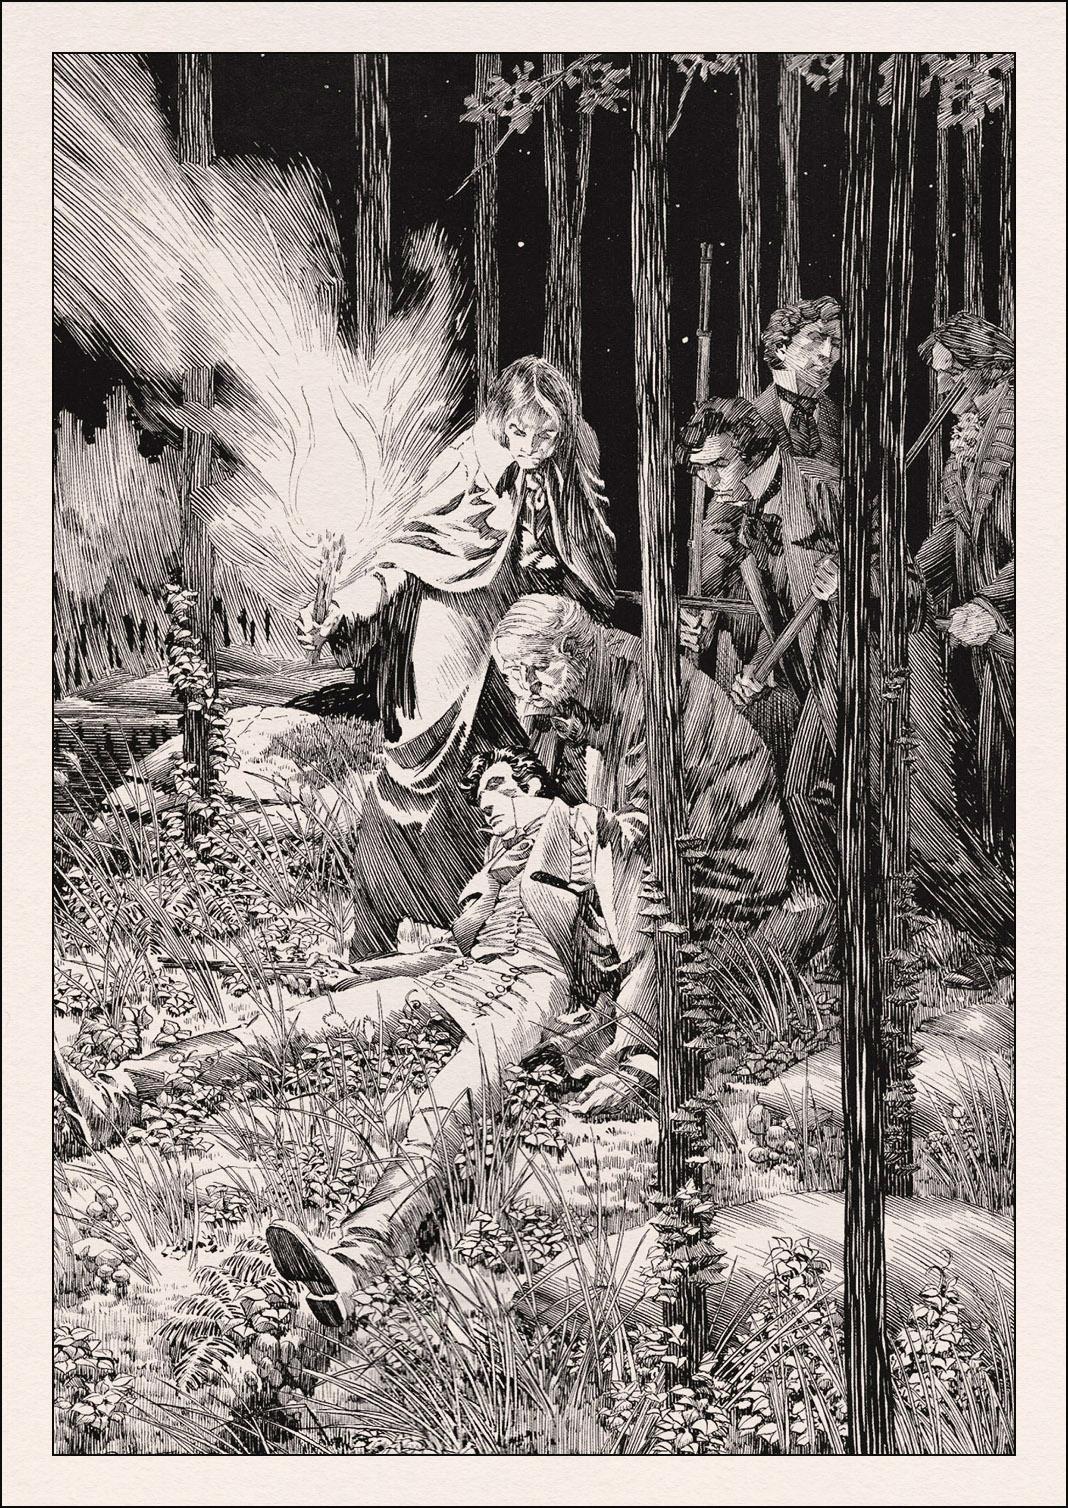 Berni Wrightson, Frankenstein